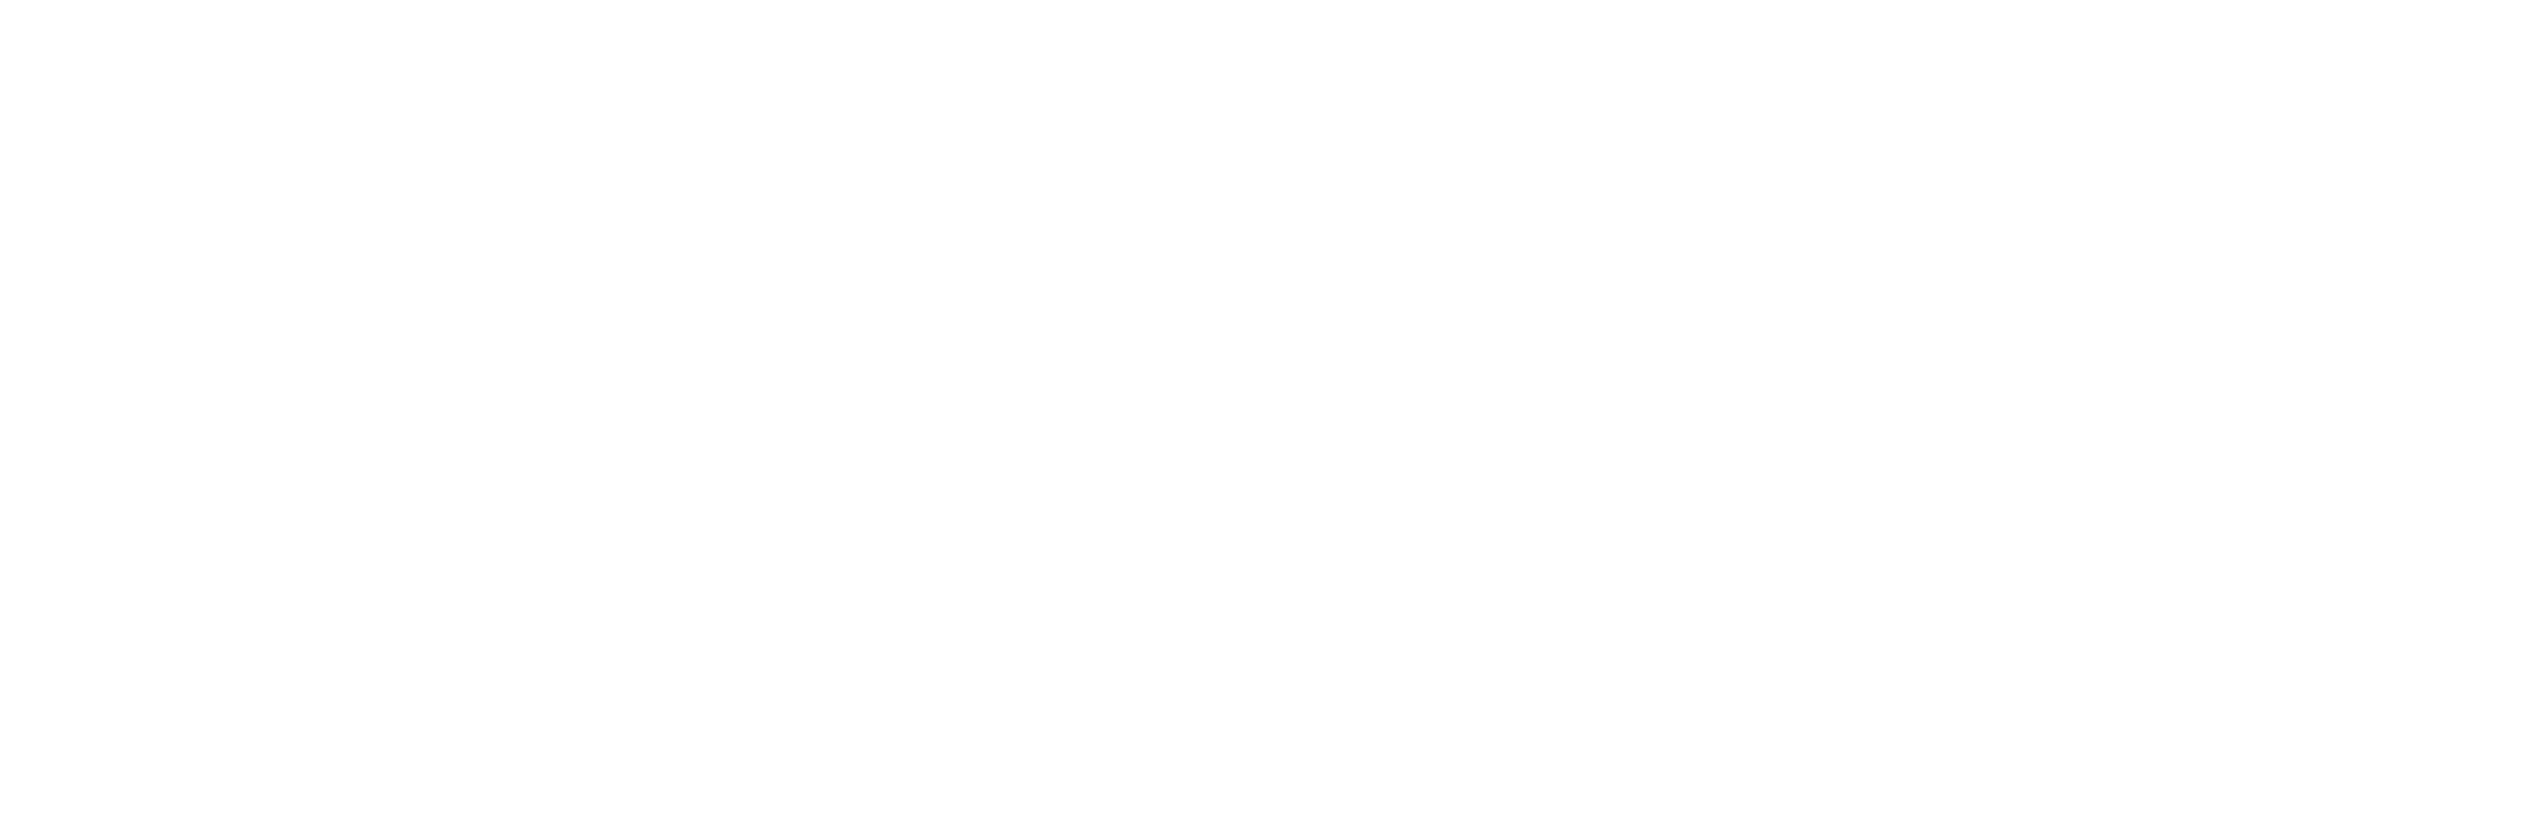 Hyatt legal plan by Metlaw logo in white